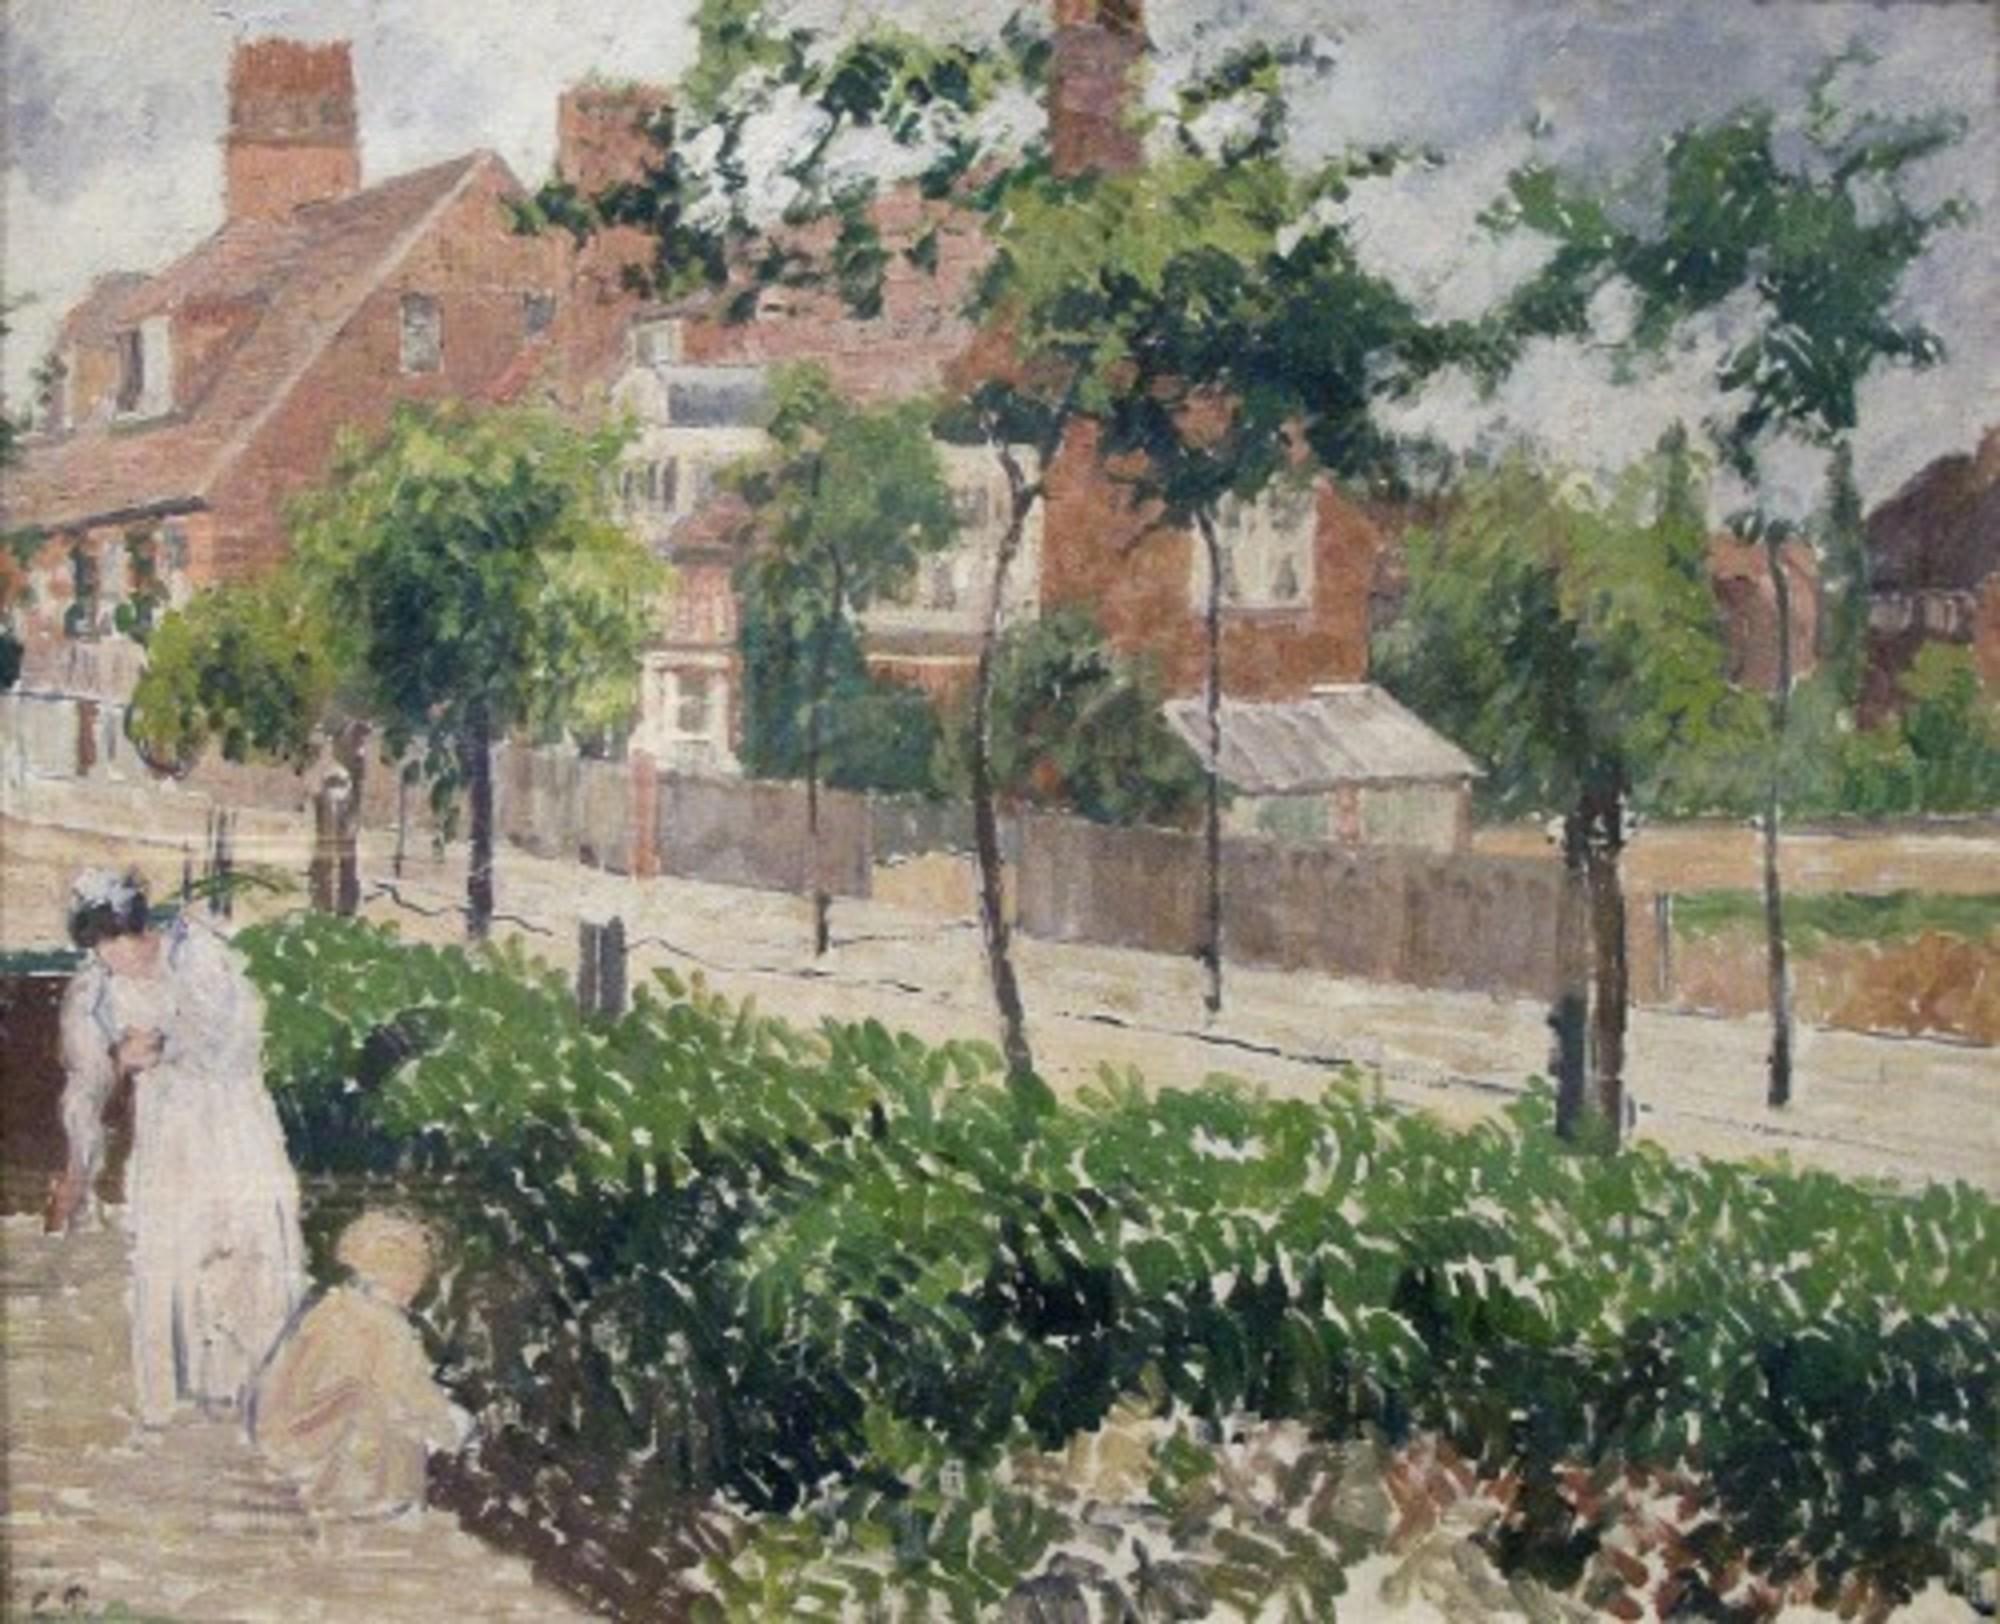 Bath-Road-London-by-Camille-Pissarro.jpg